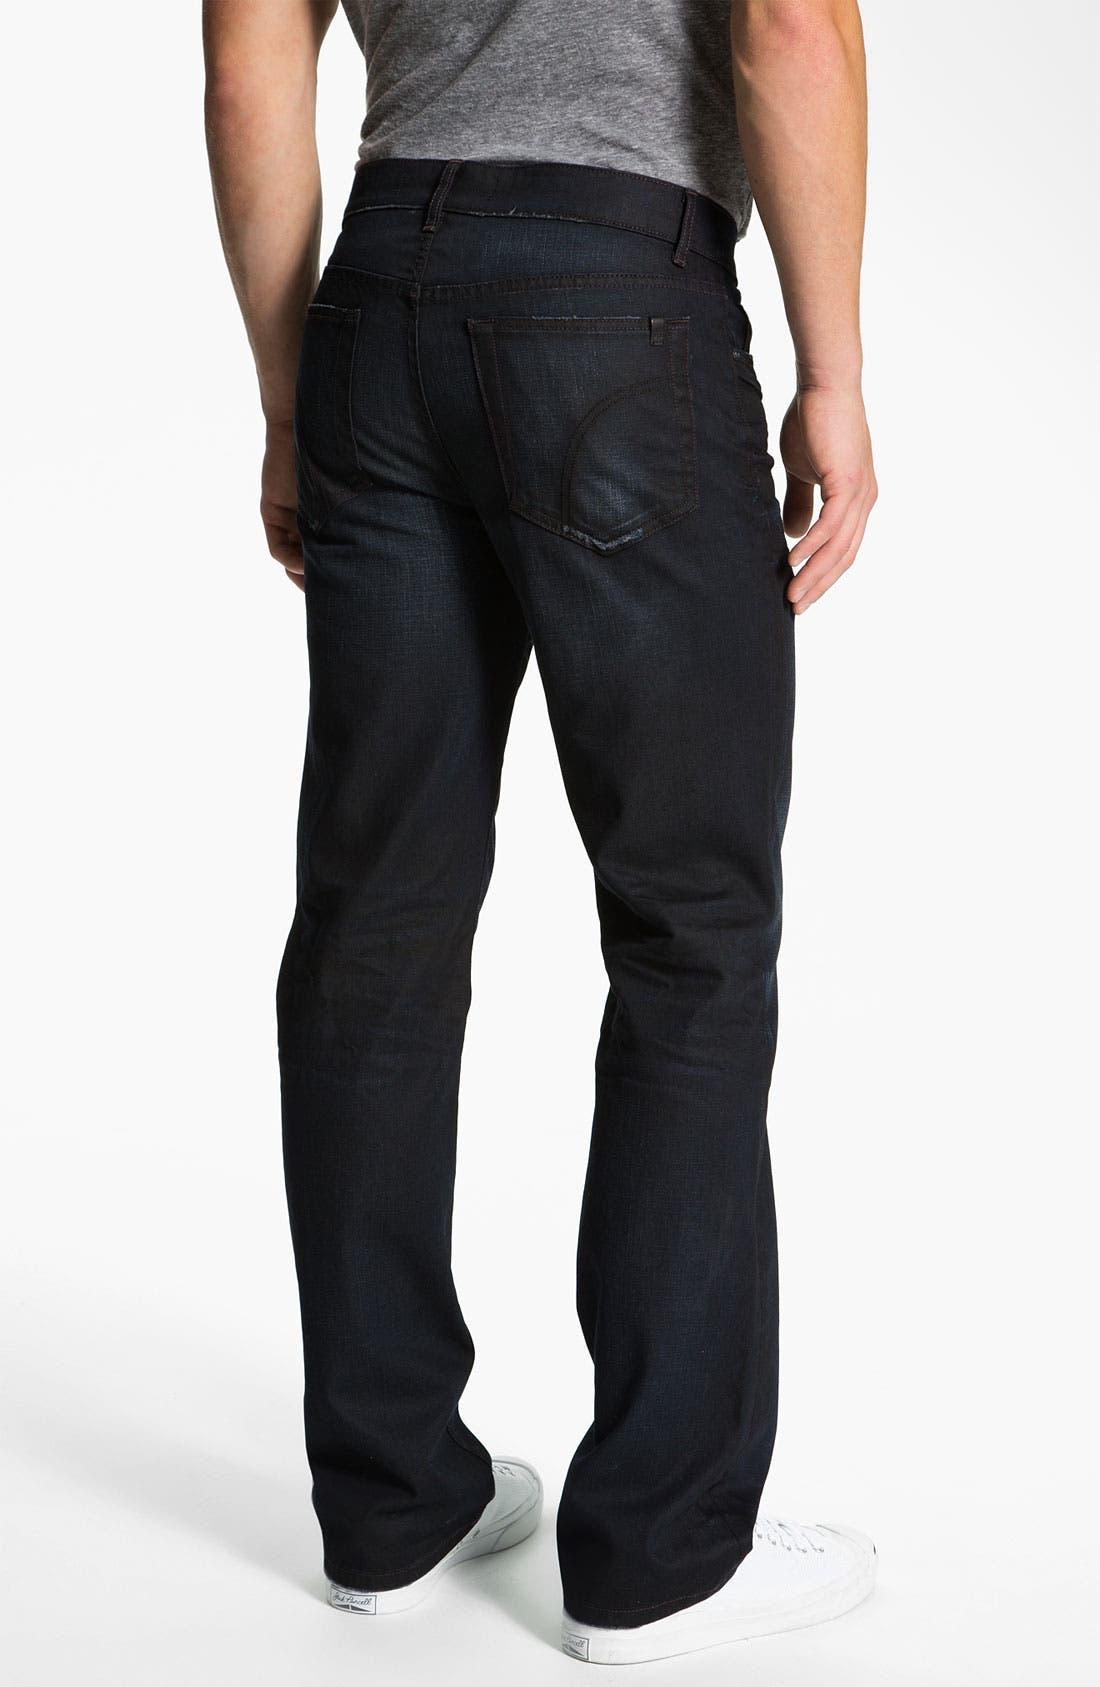 Alternate Image 1 Selected - Joe's 'Rebel' Relaxed Fit Jeans (Fredrick)